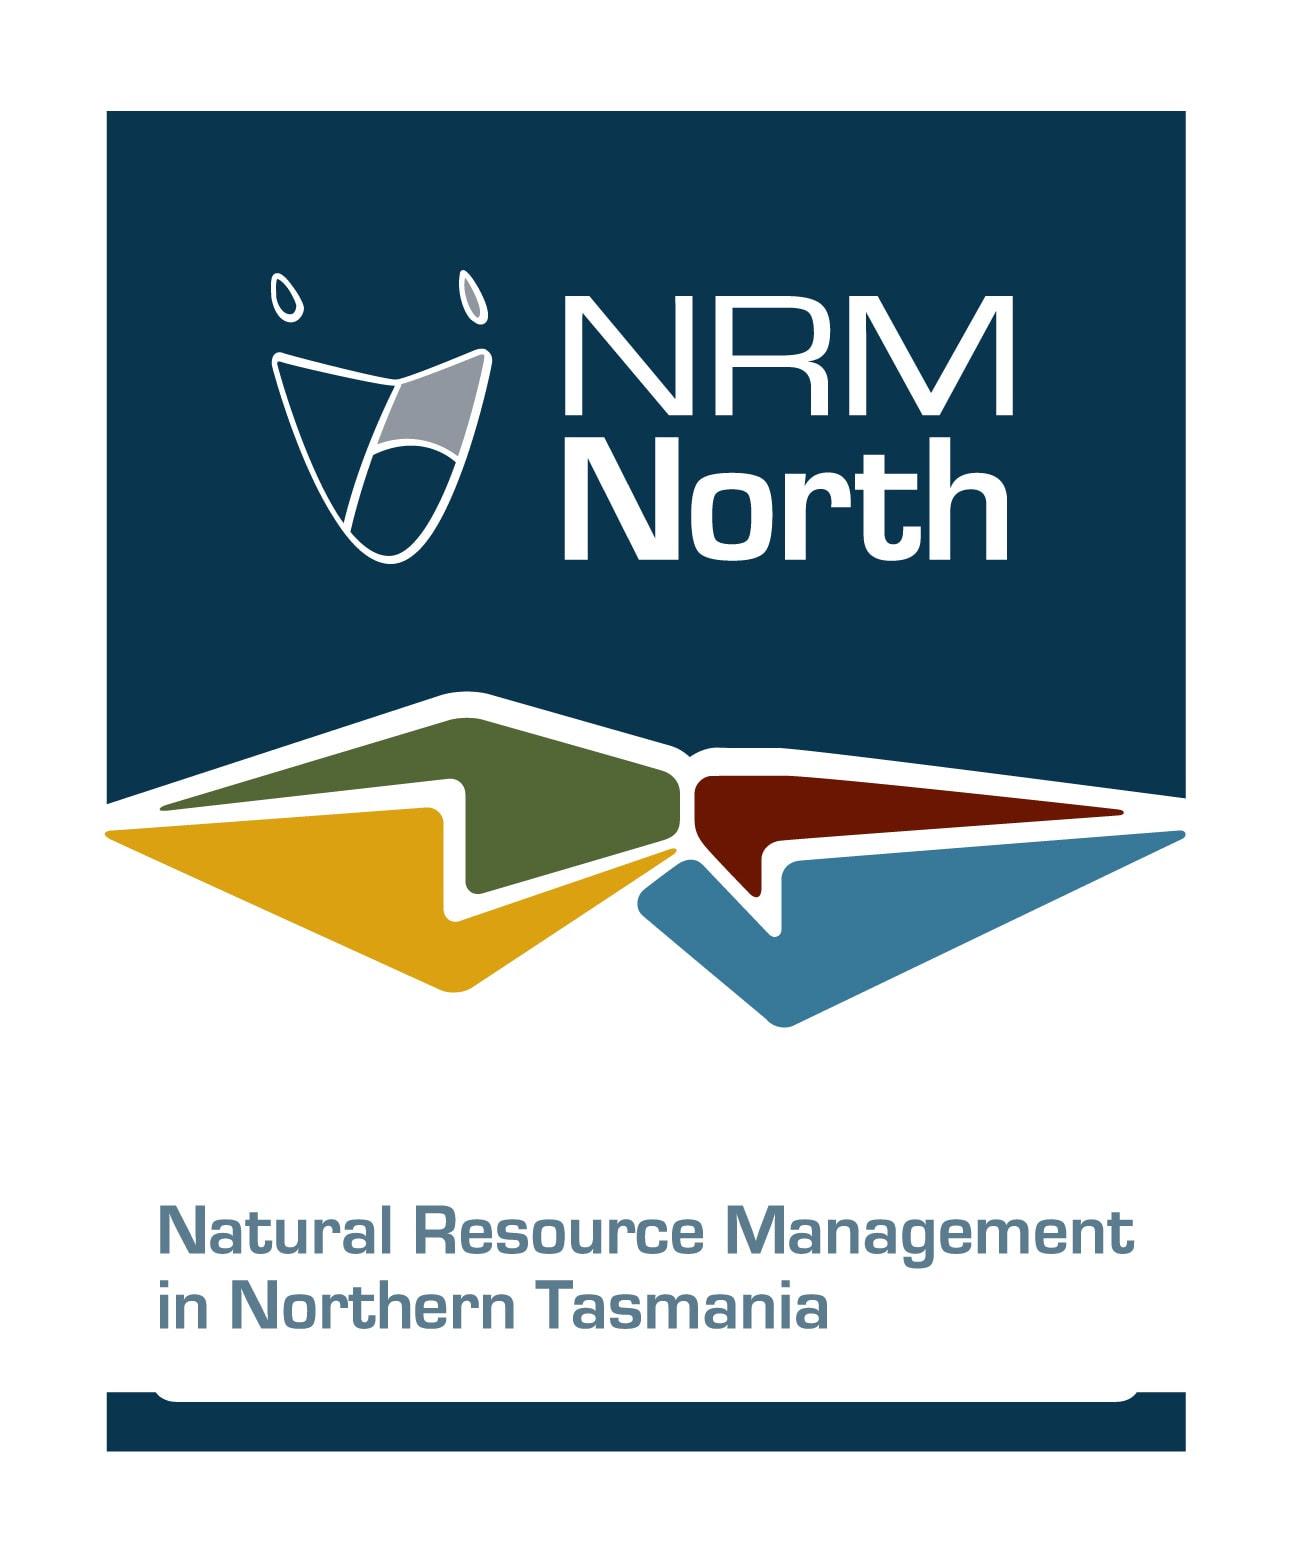 NRM_north.jpg